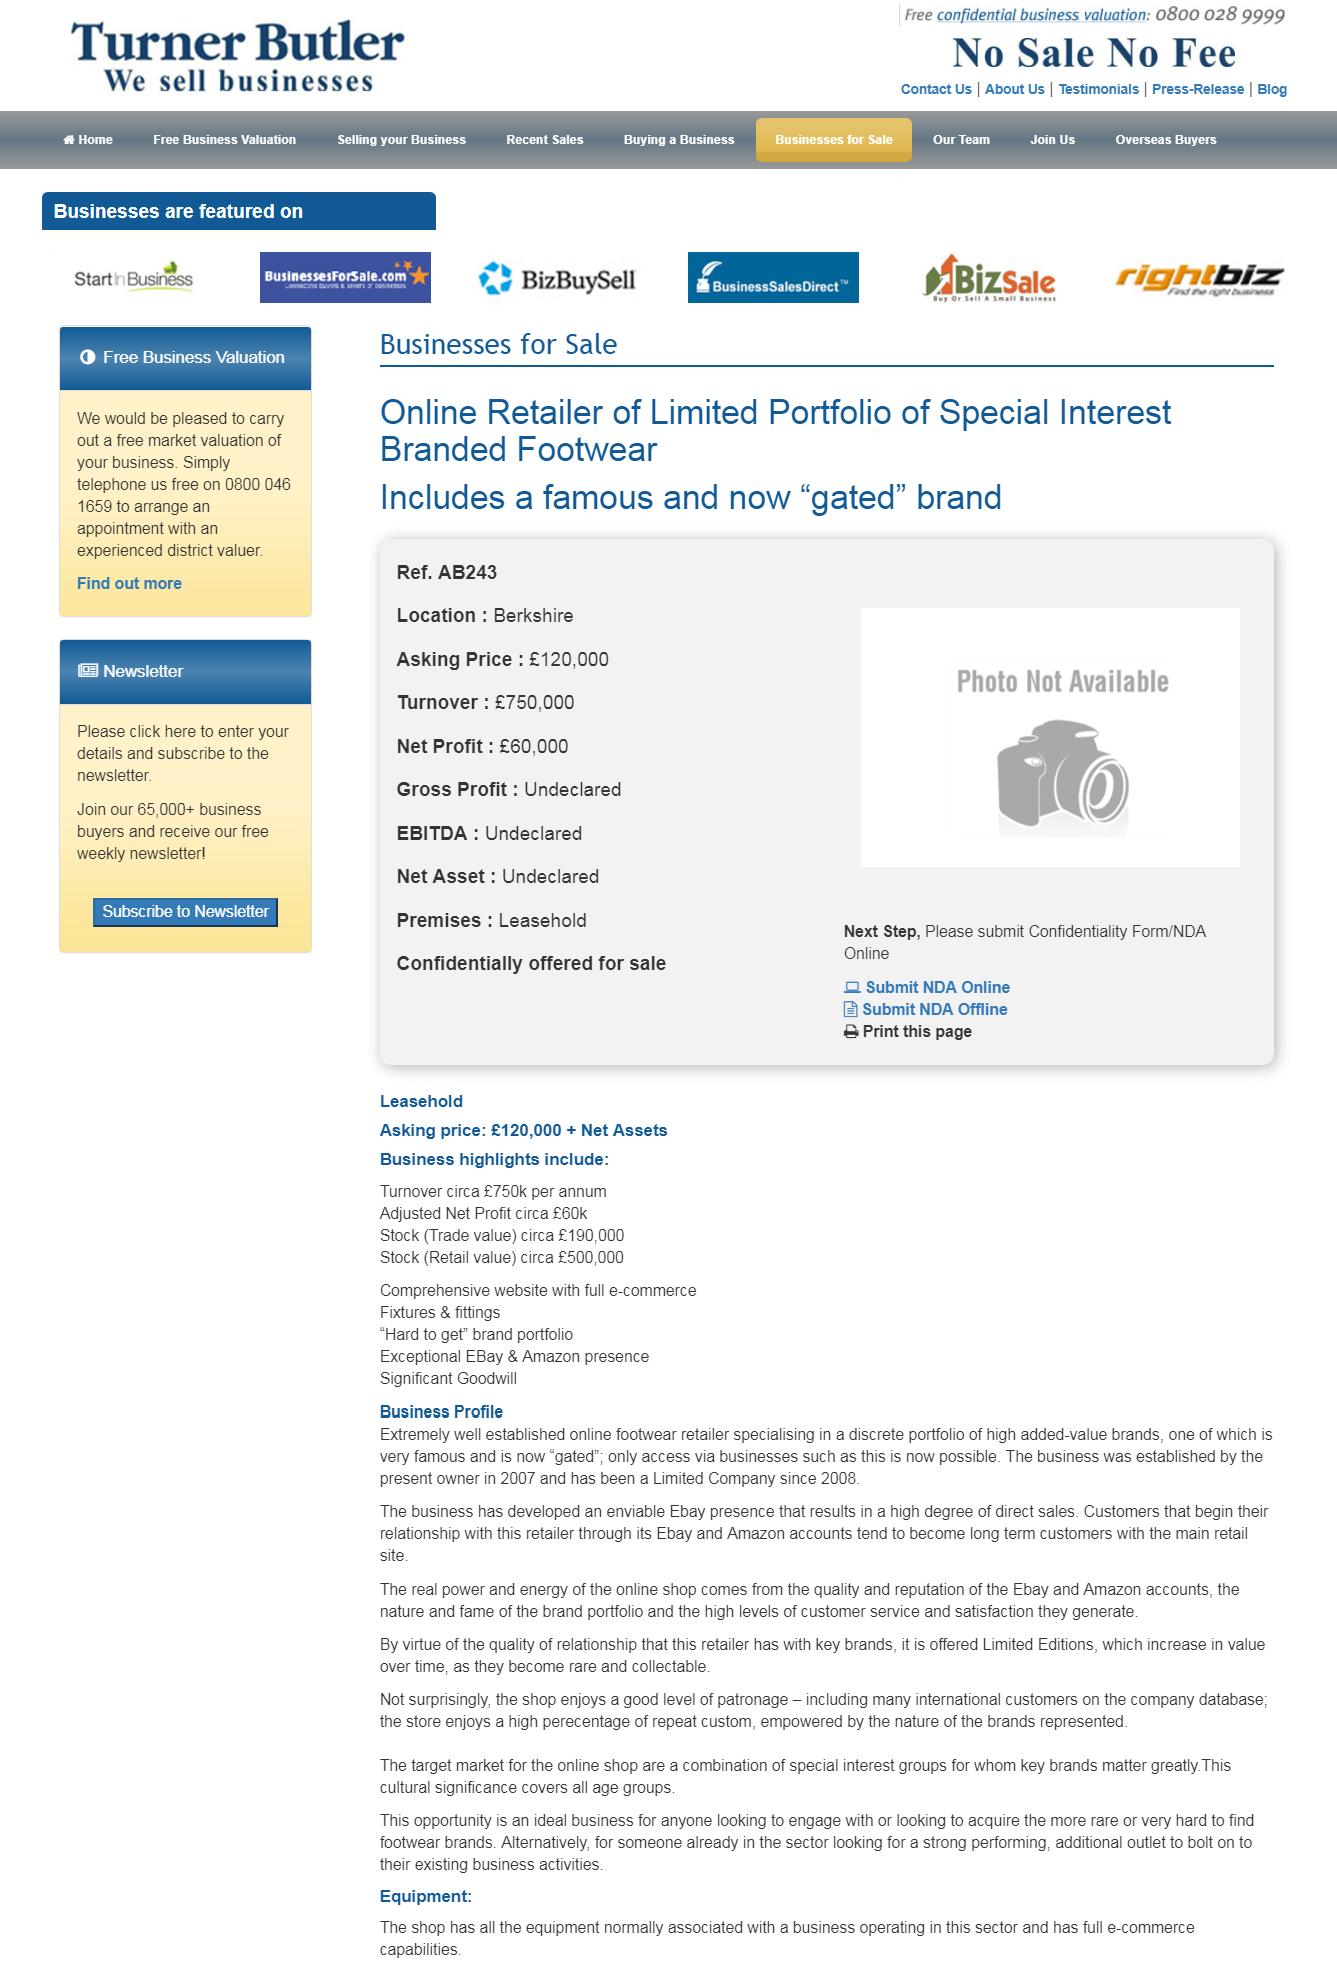 Online Retailer Of Limited Portfolio Of Special Interest Branded